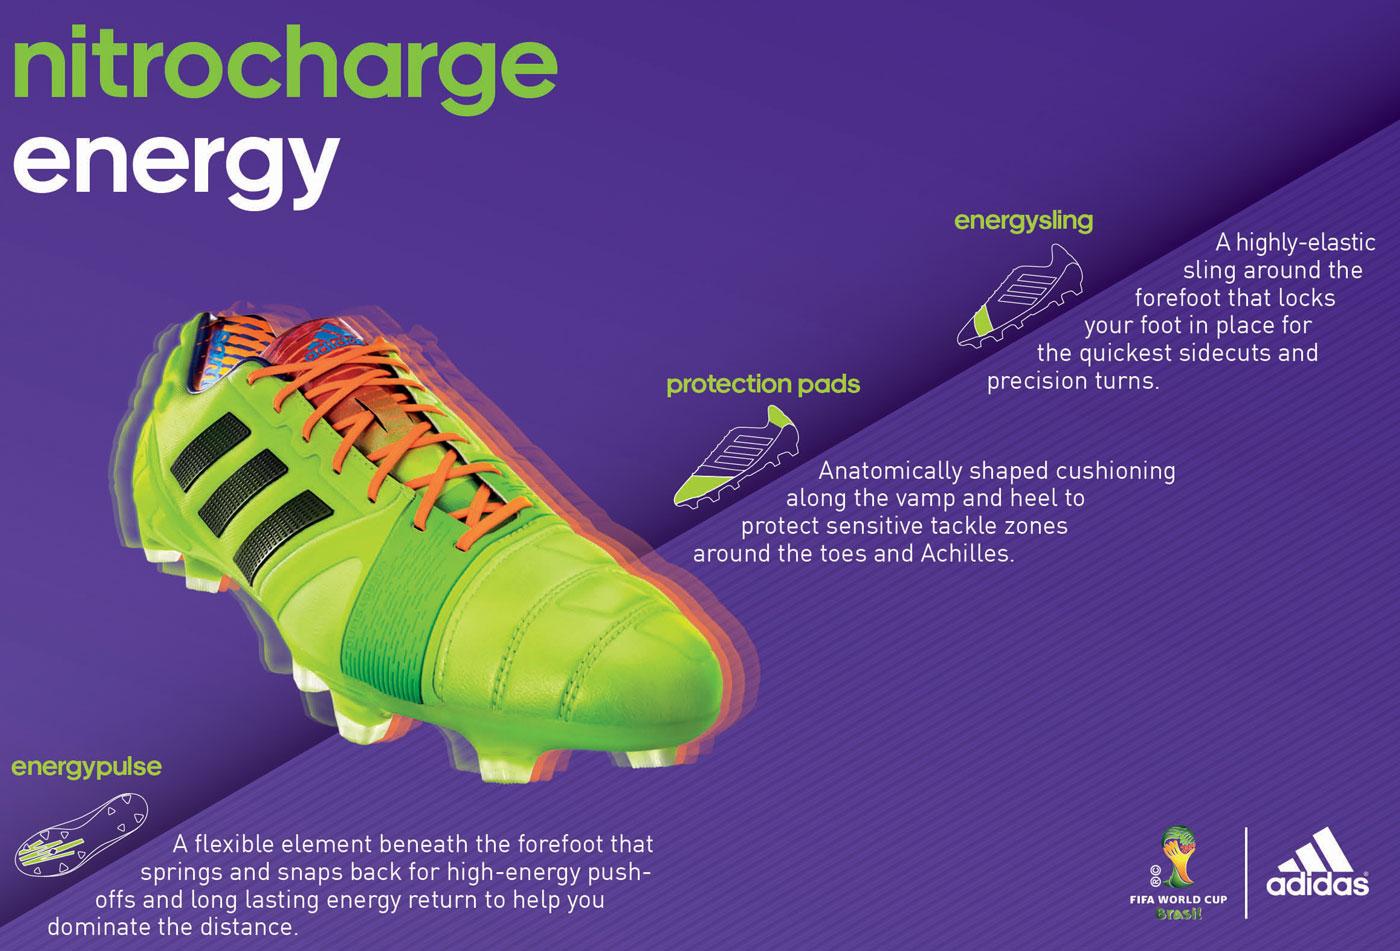 Adidas Nitrocharge 1.0 TRX FG Samba Edition solar Slime